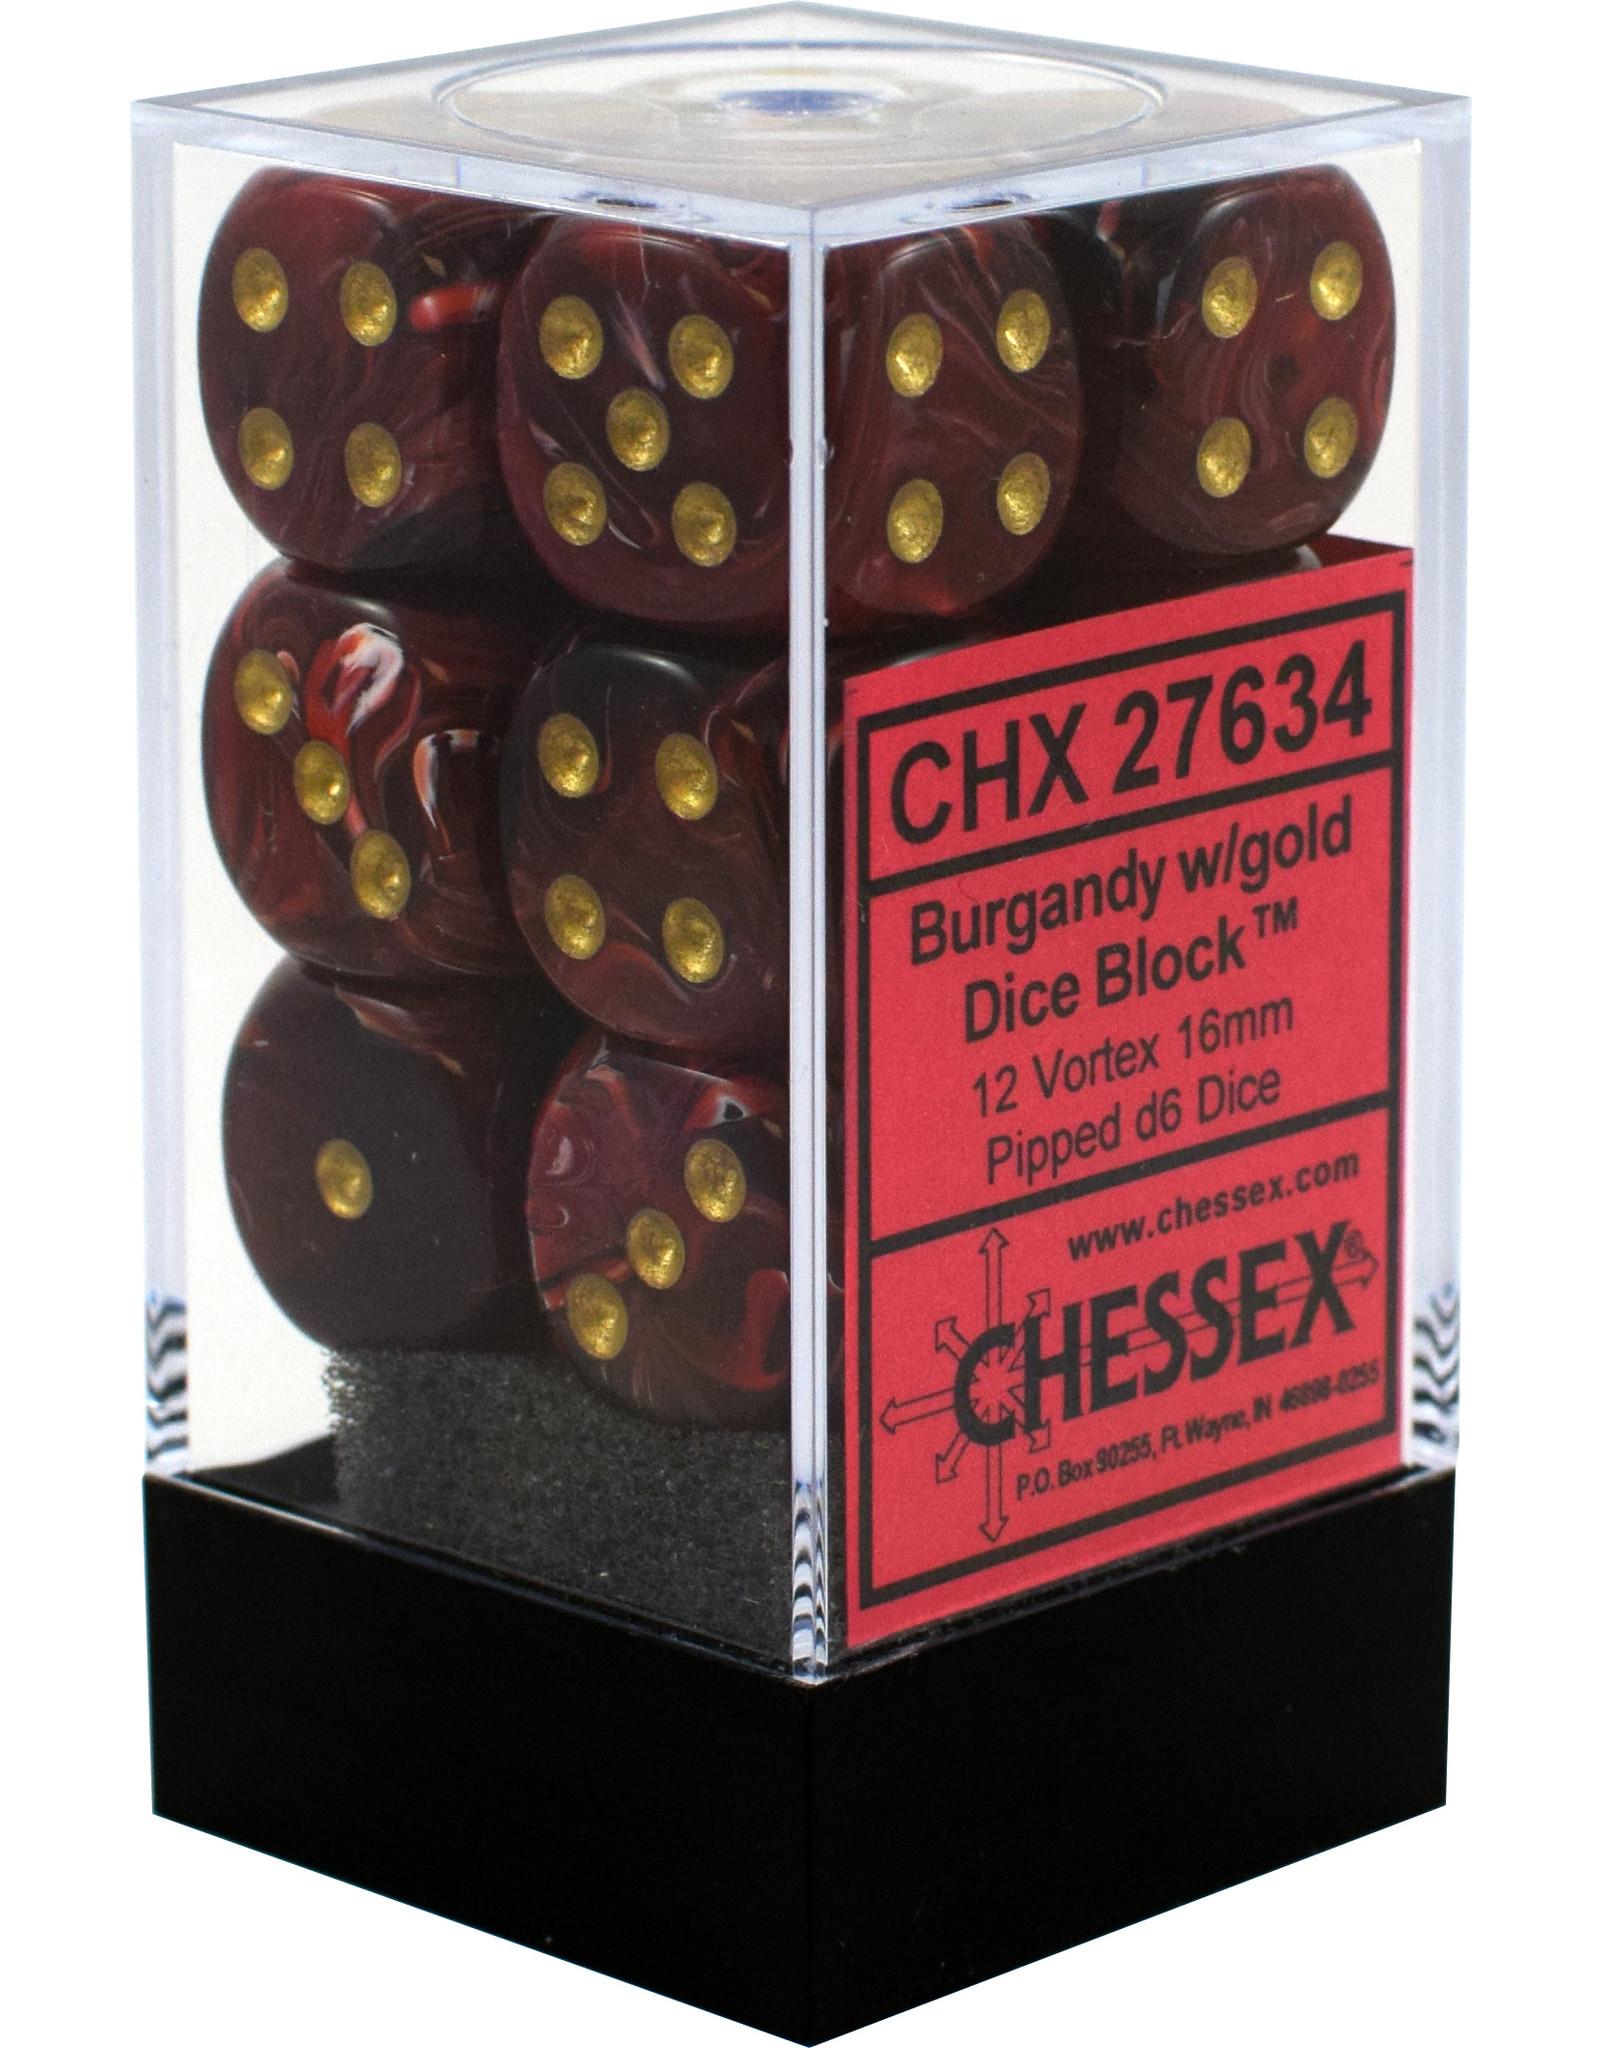 CHESSEX CHX 27634 16MM D6 DICE BLOCK VORTEX BURGUNDY W/GOLD